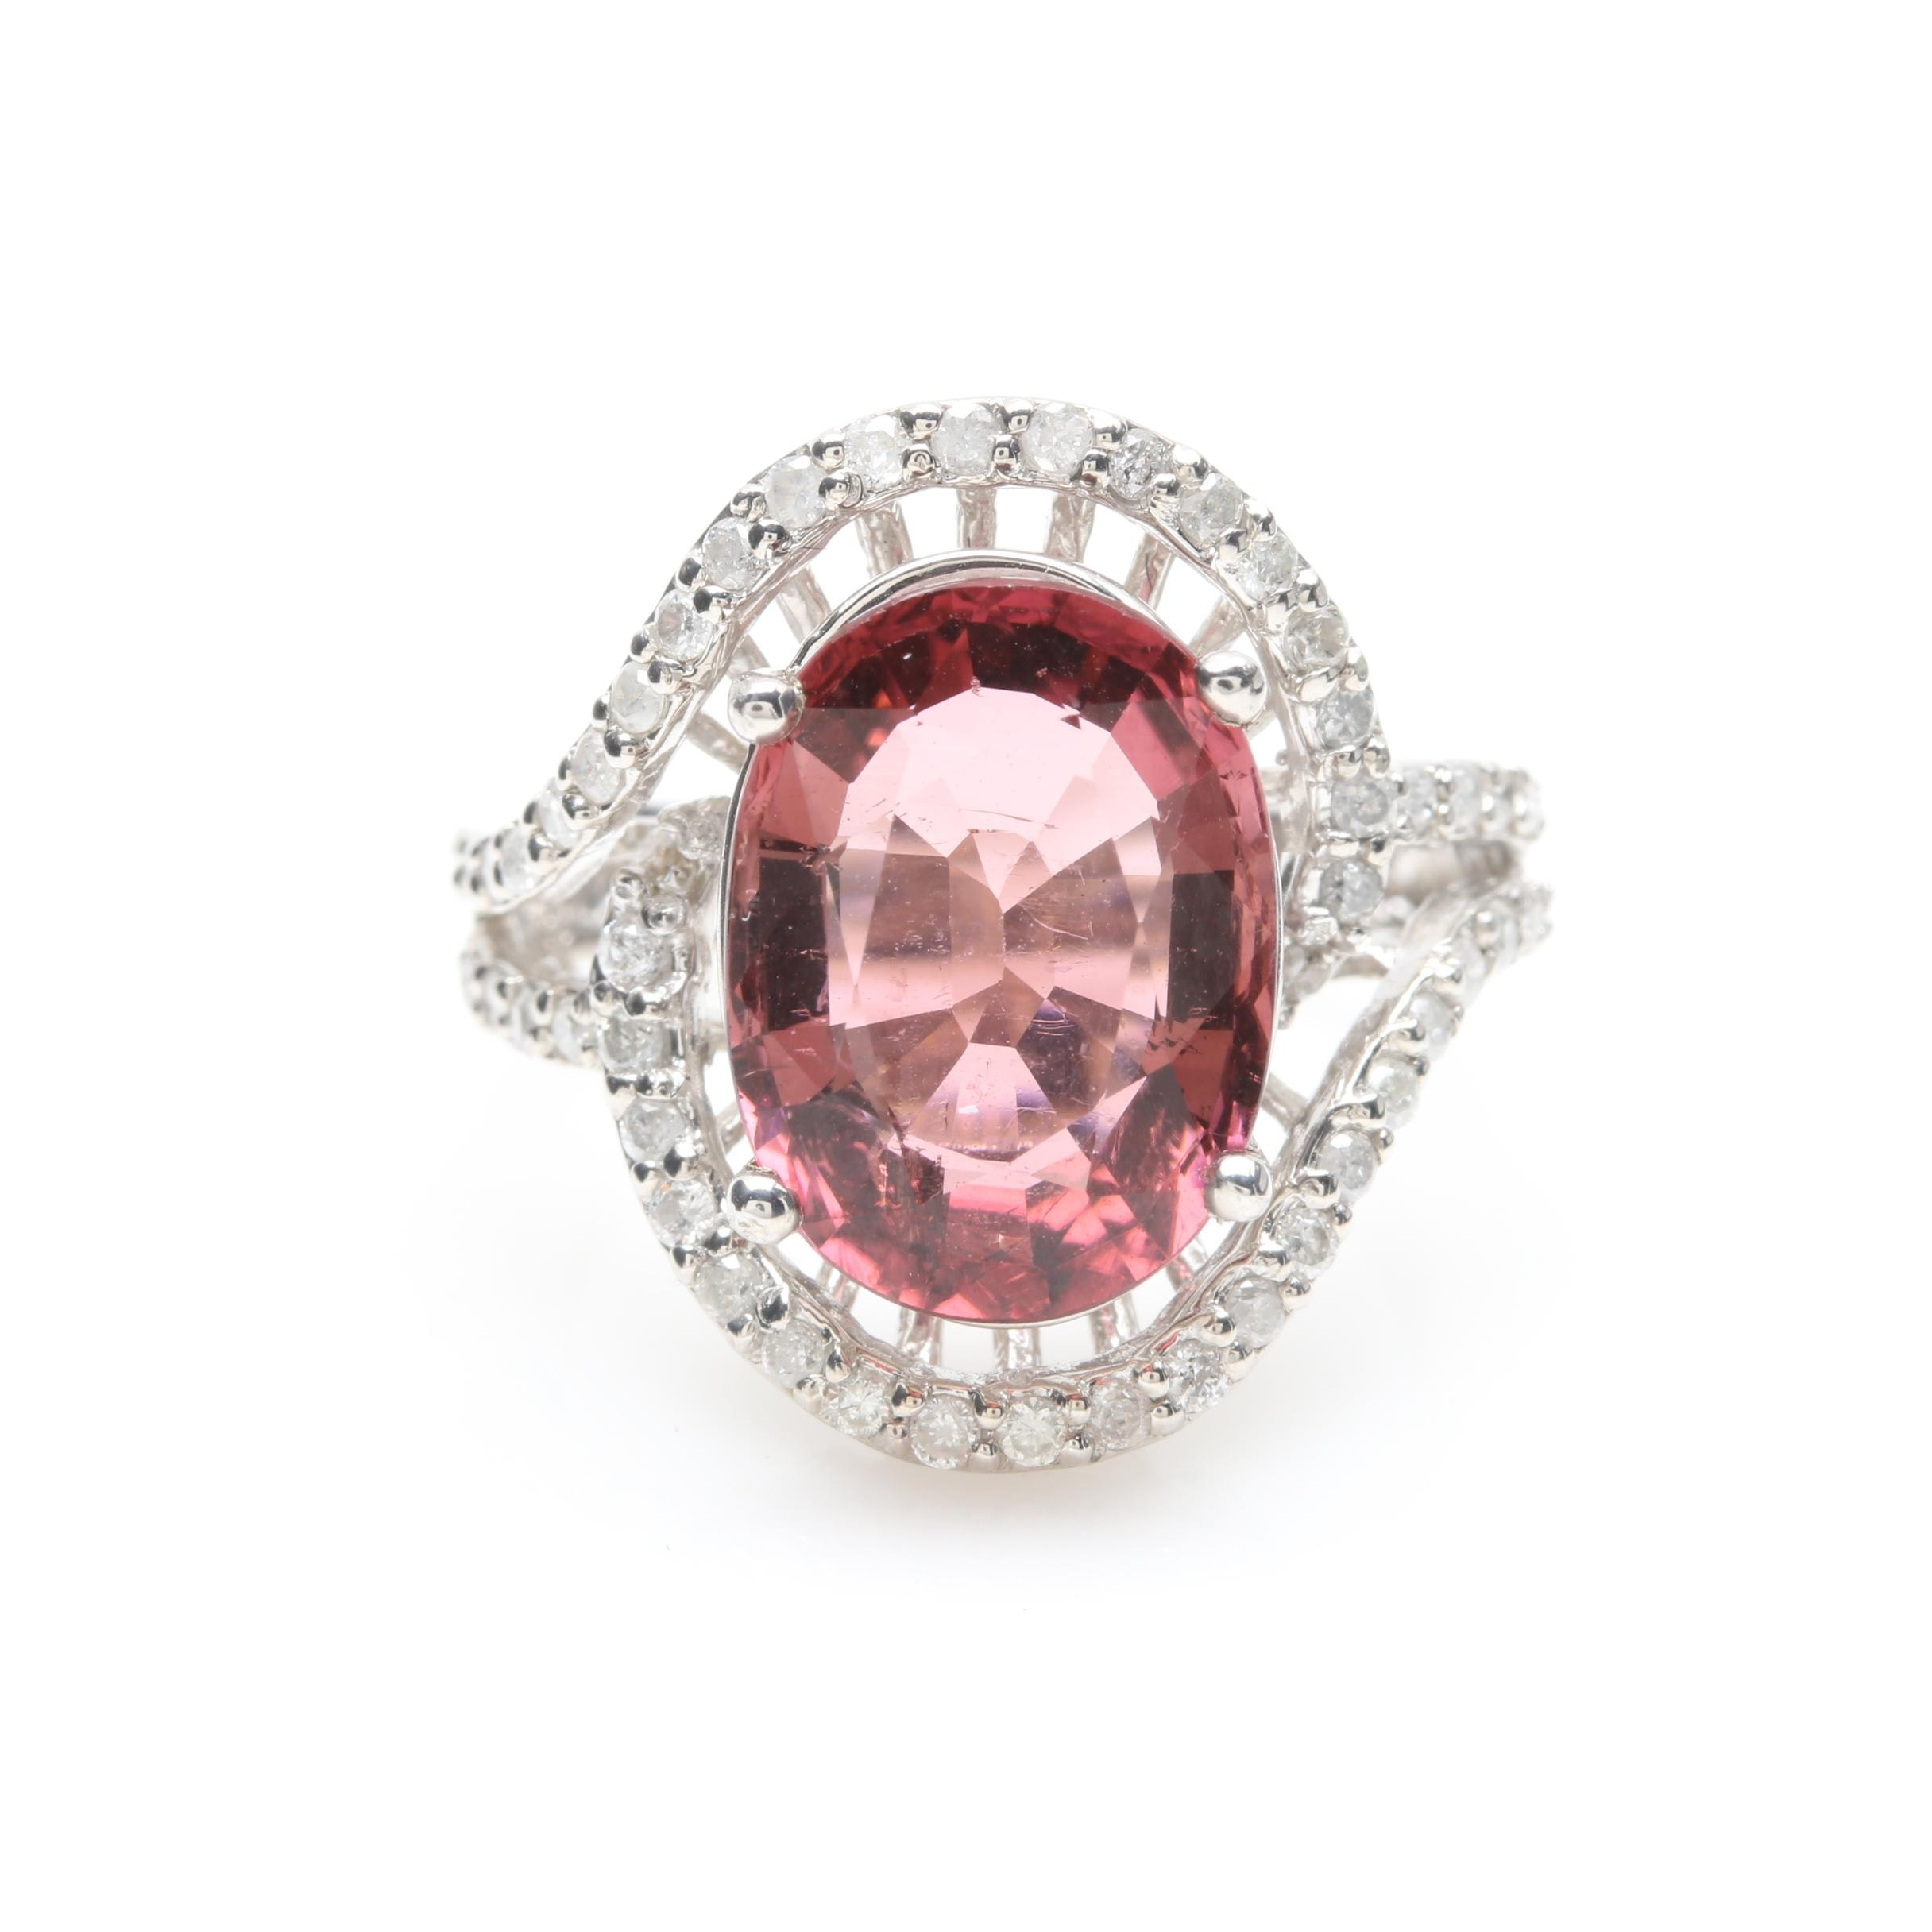 14K White Gold 4.05 CT Pink Tourmaline and Diamond Ring